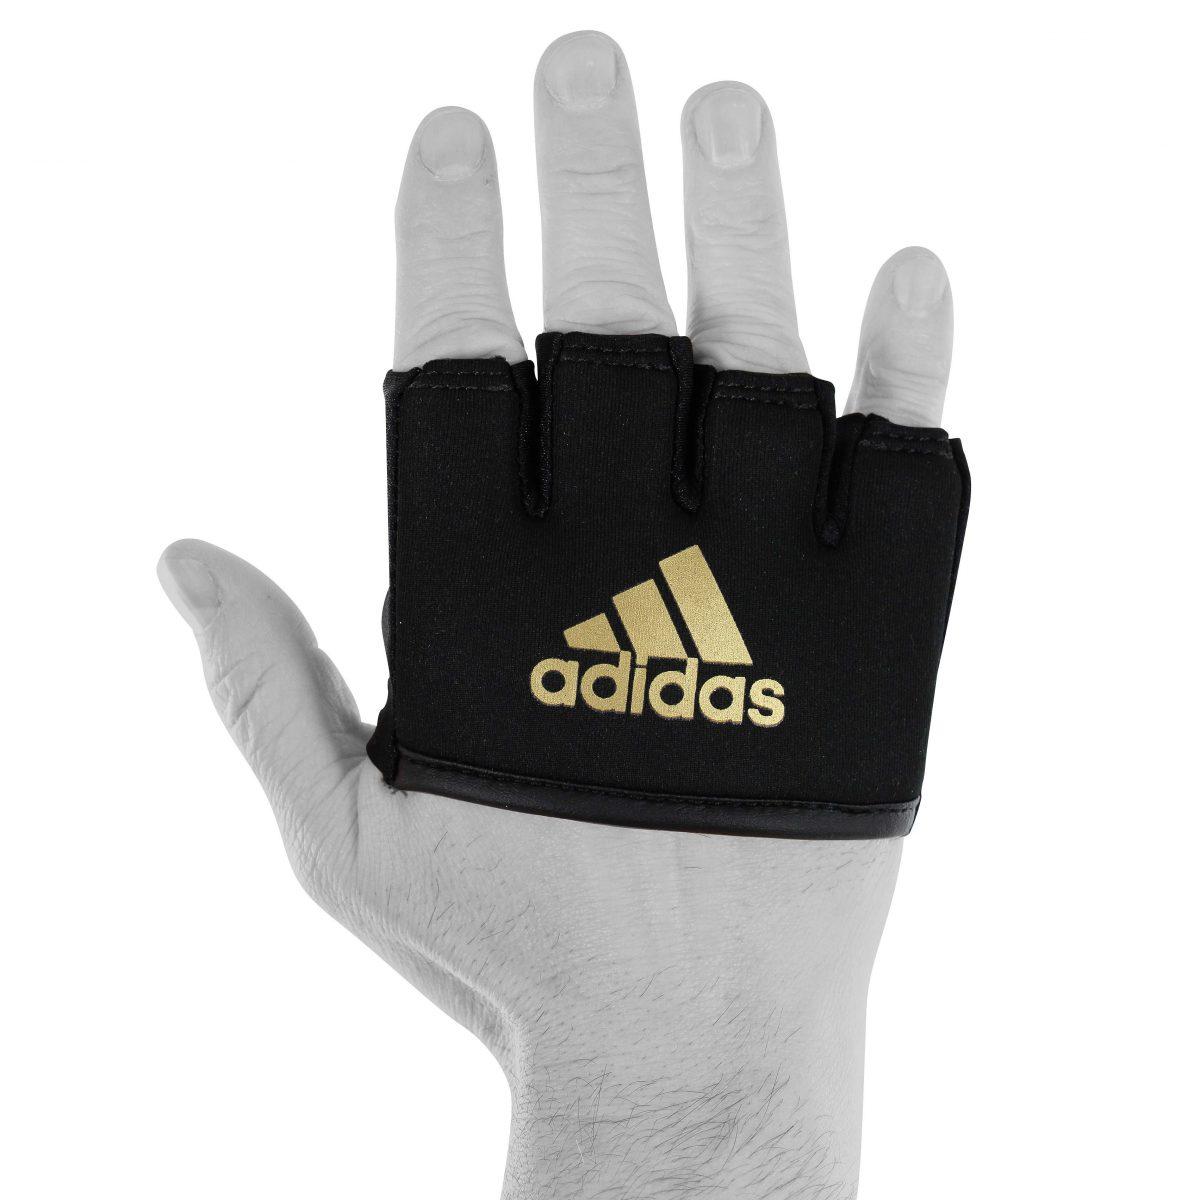 "Adidas Handschutz ""Knuckle Sleeve"" - Fitnessgeräte - Adidas"